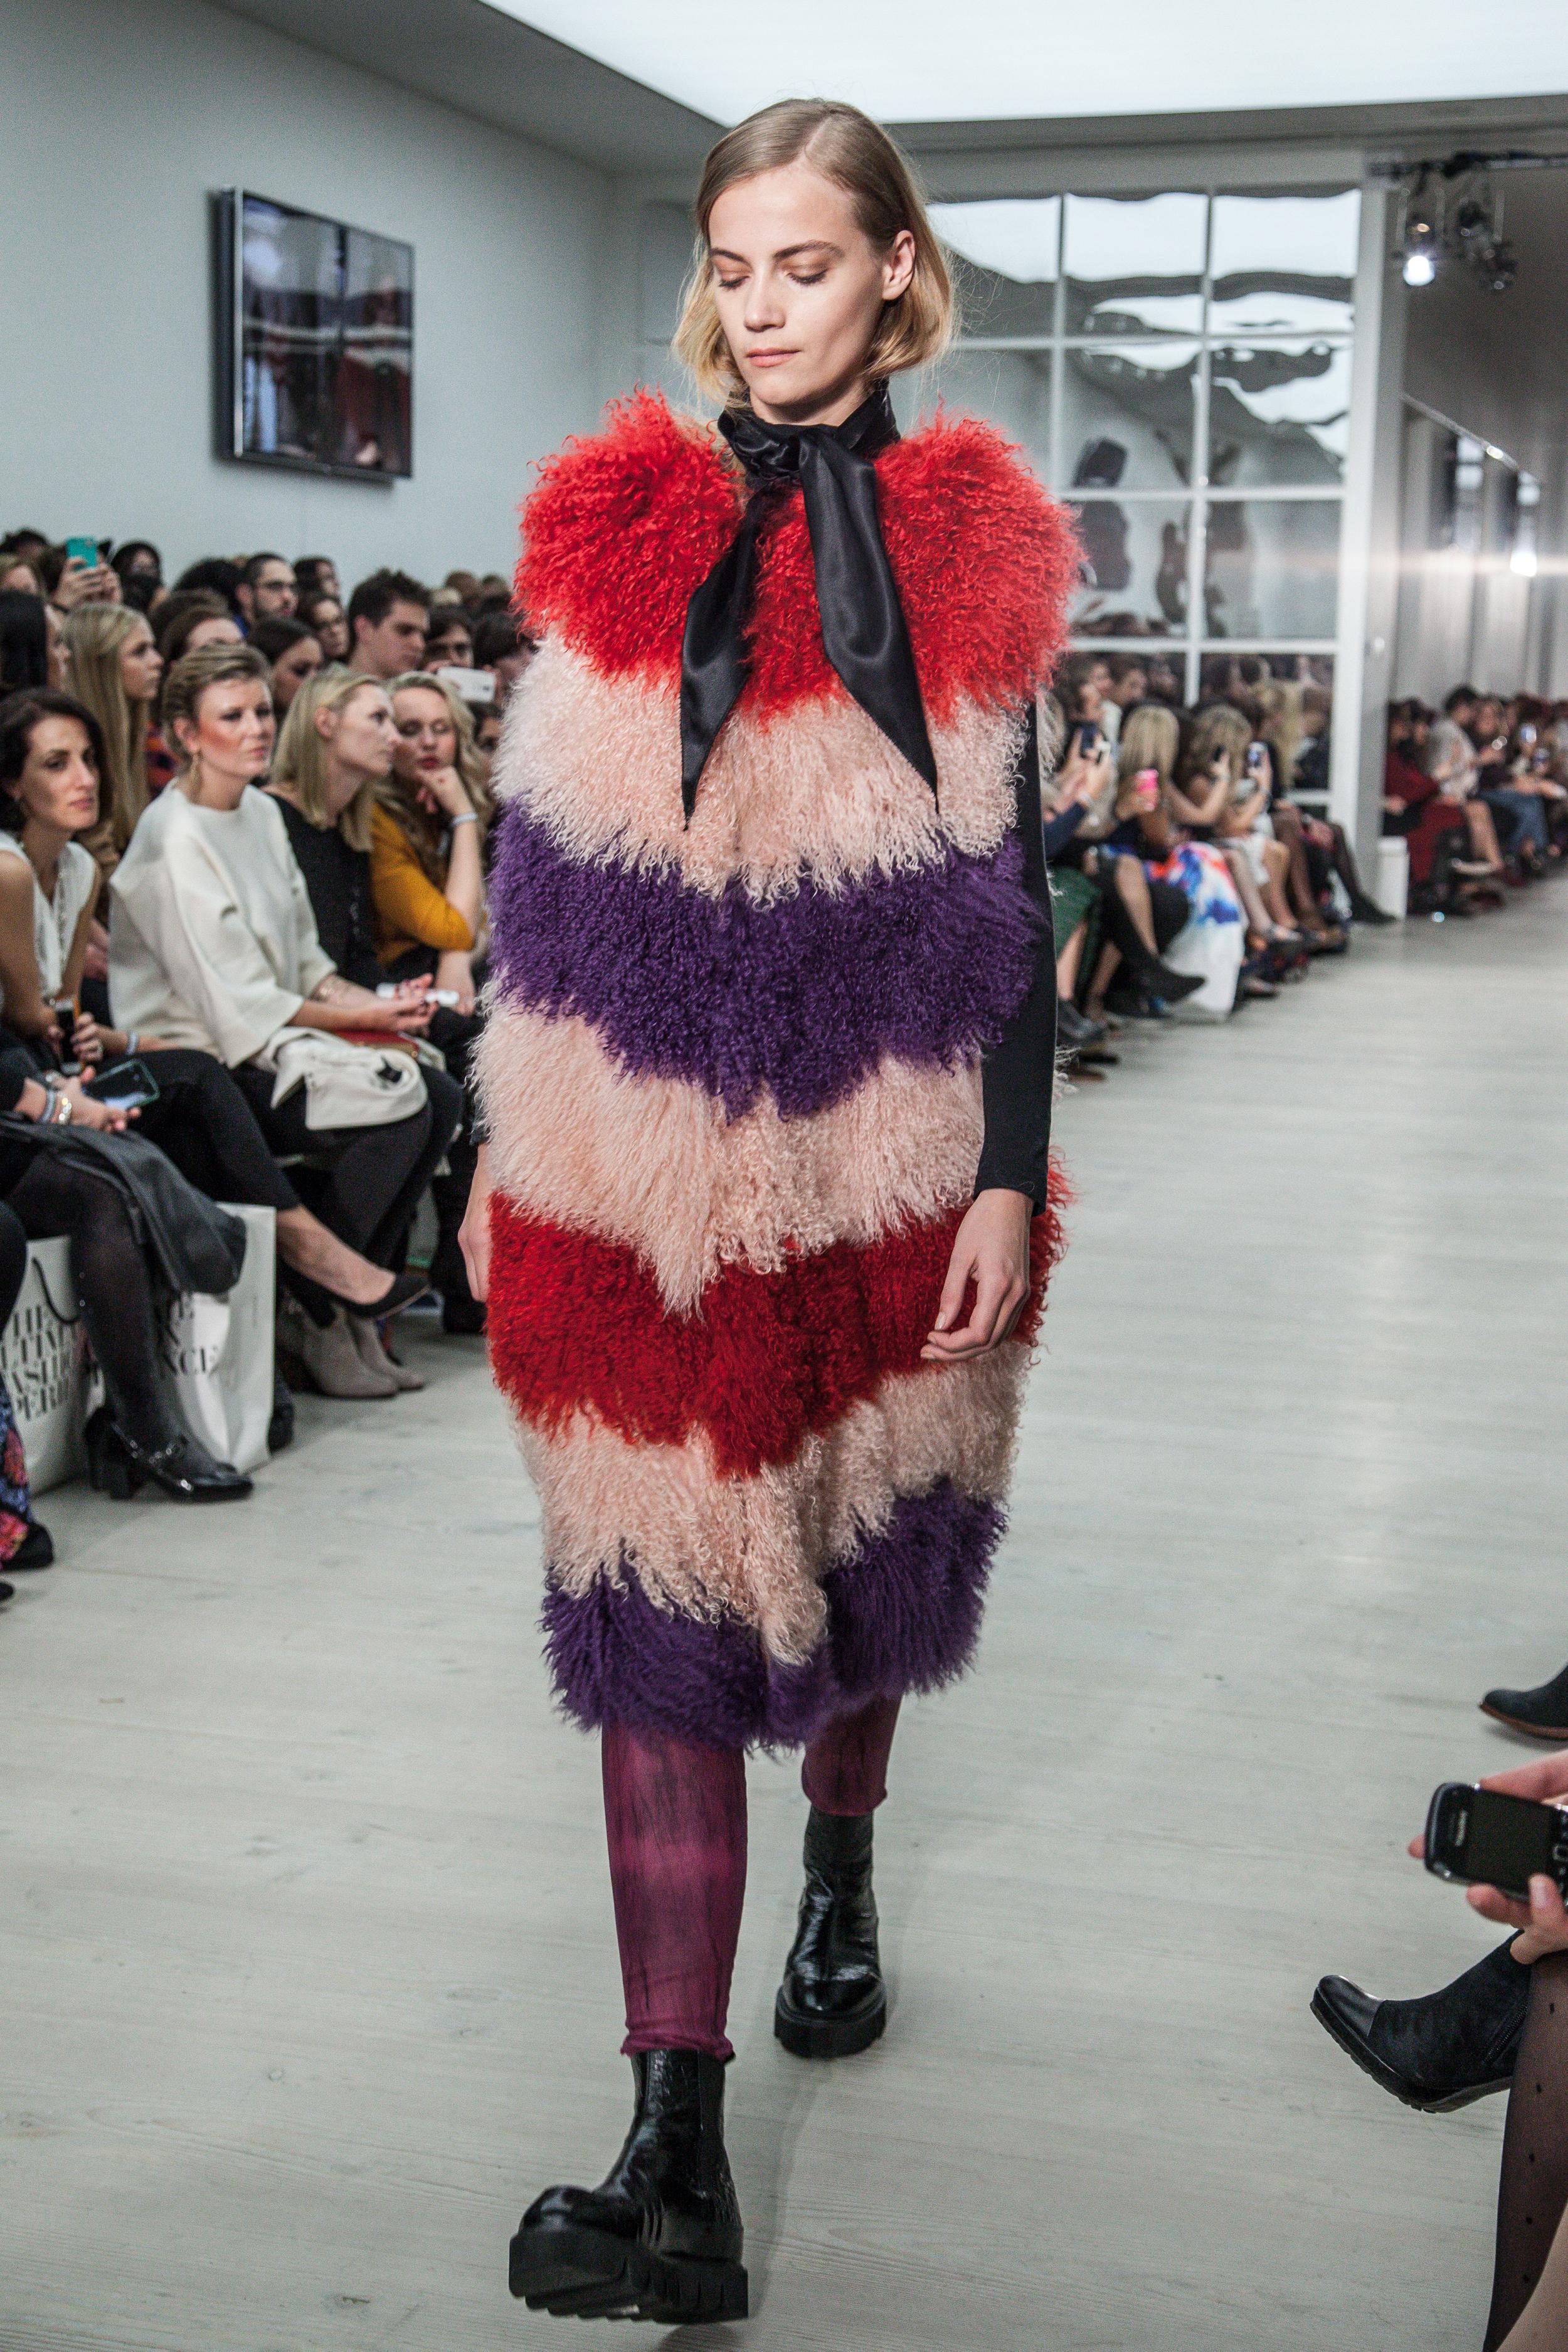 London_Fashion_Week_by_Sam_Geals_InlineSix_Photography0330.jpg